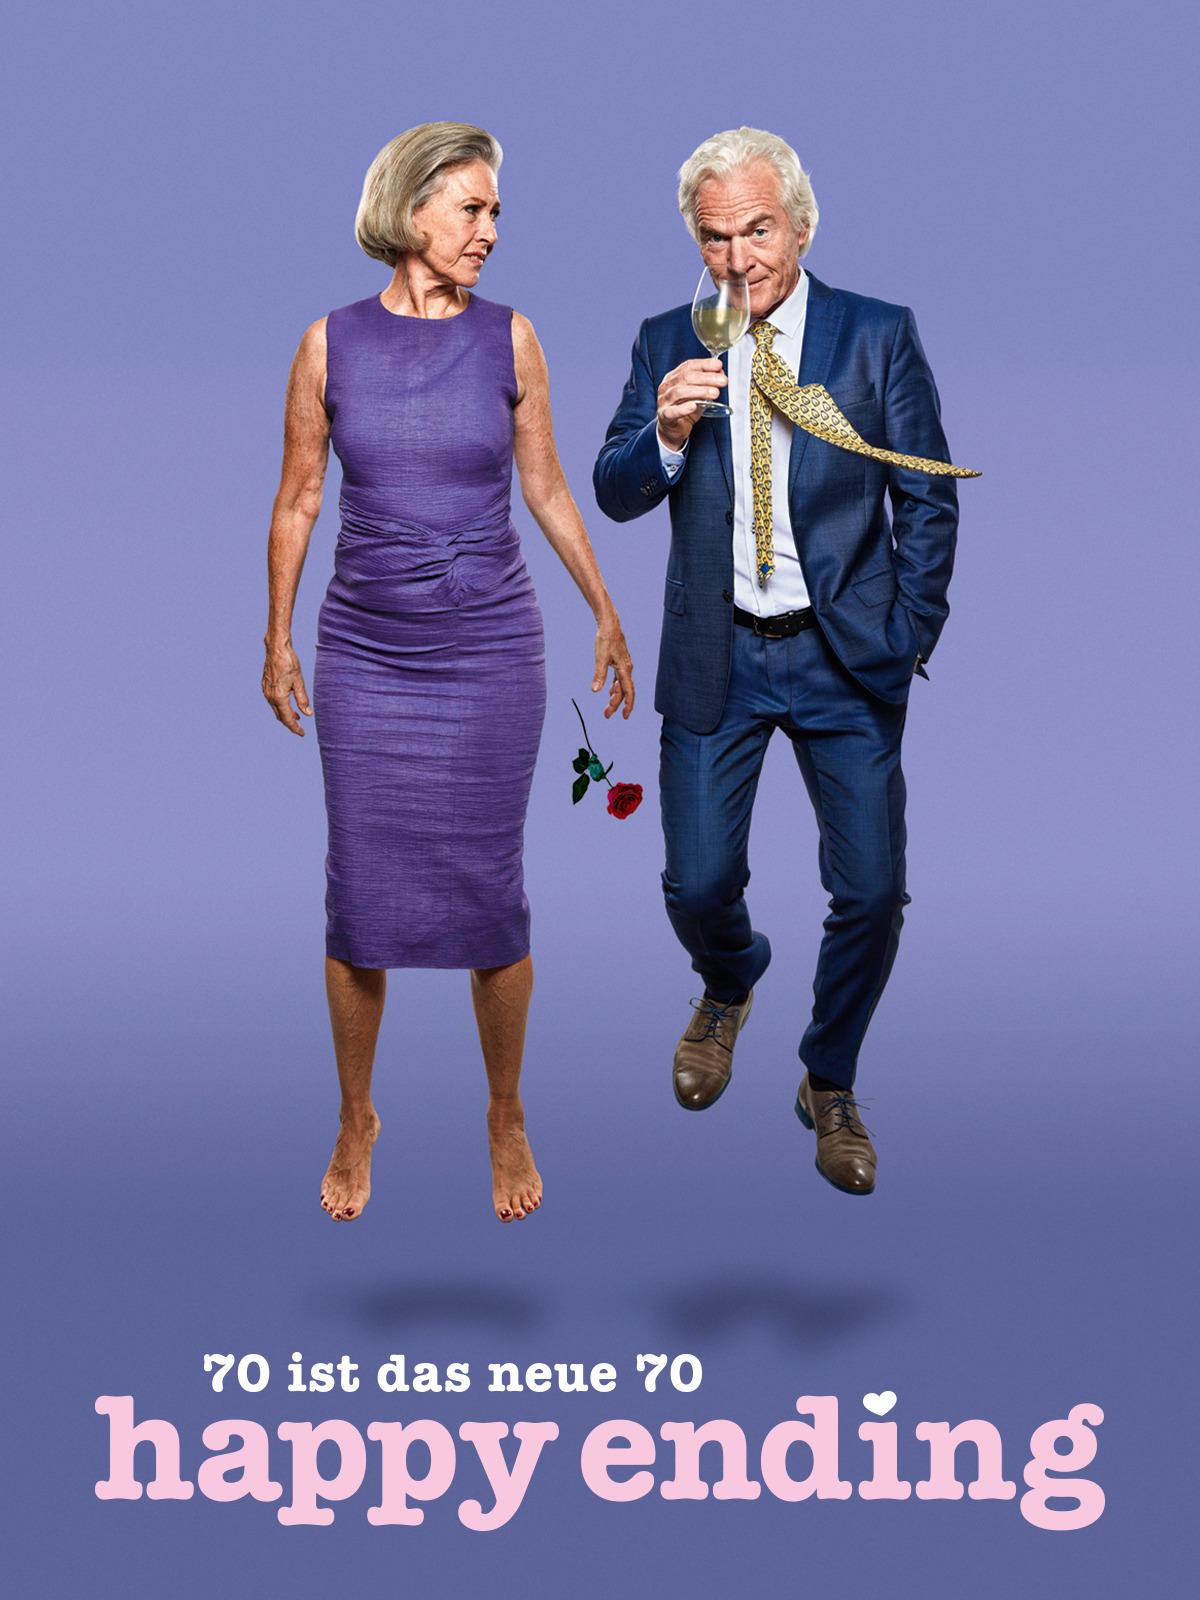 Happy Ending - 70 ist das neue 70